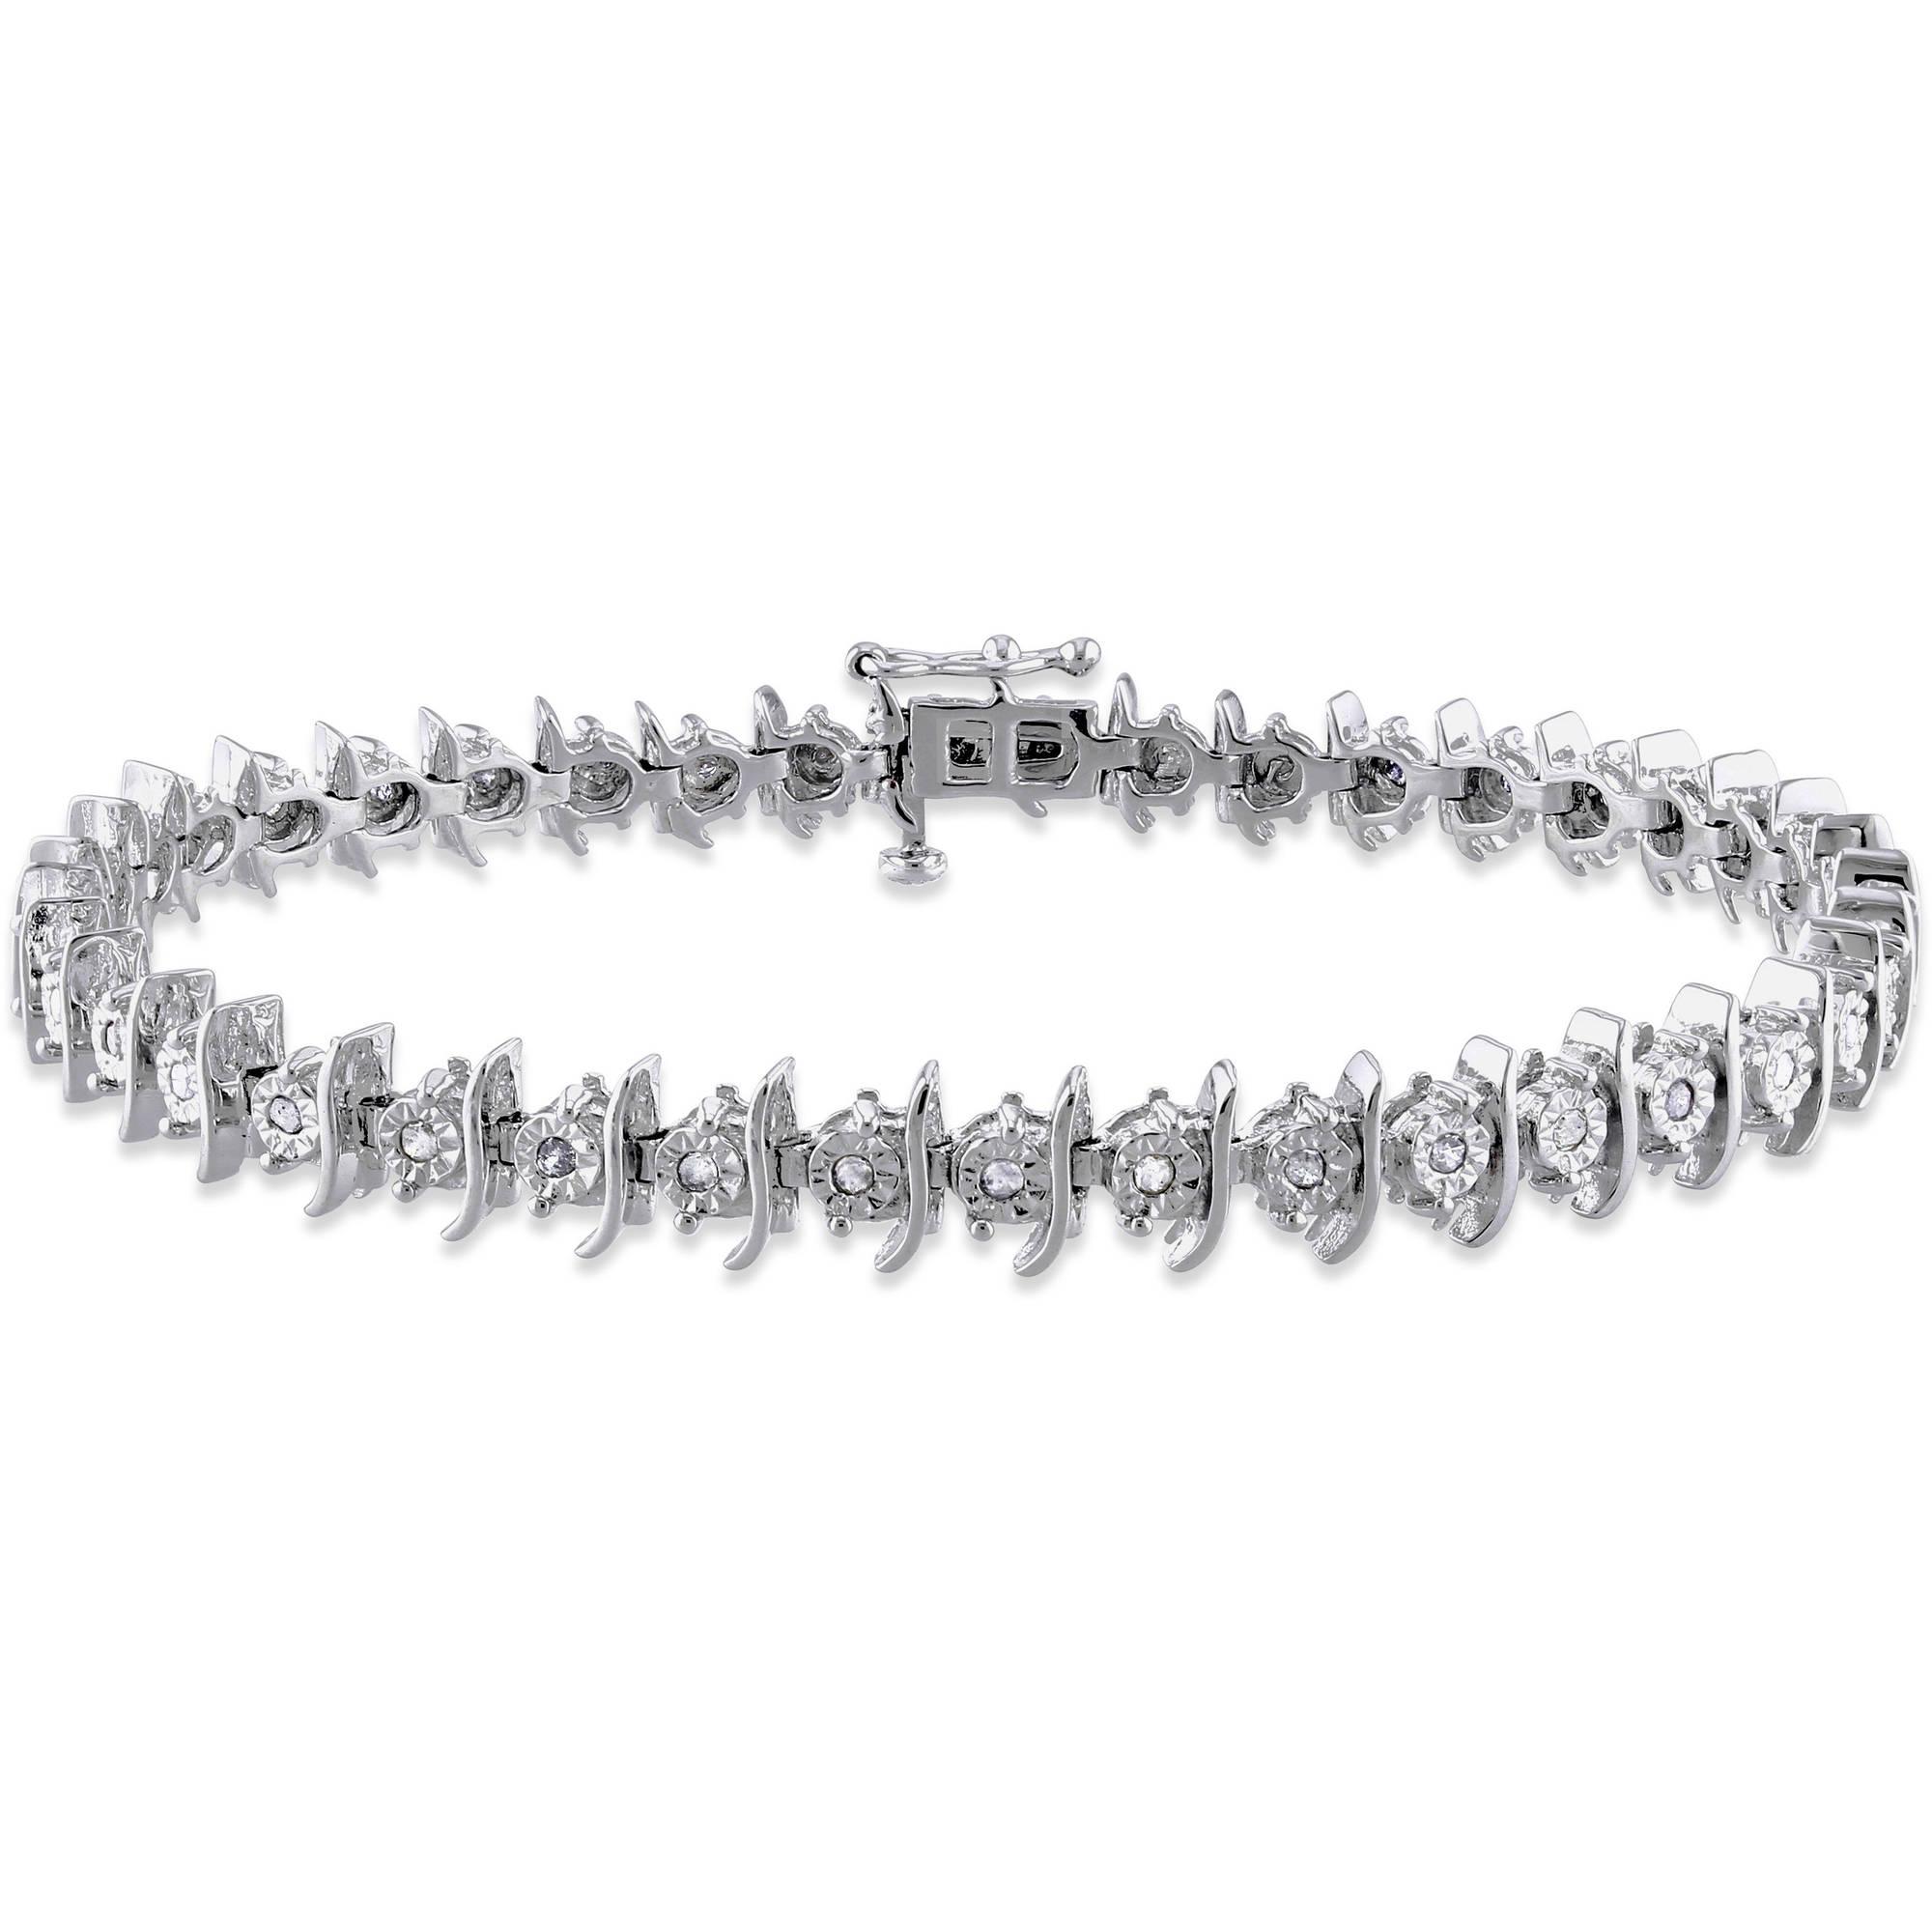 Miabella 1/2 Carat T.W. Diamond Sterling Silver Tennis Bracelet, 7.25